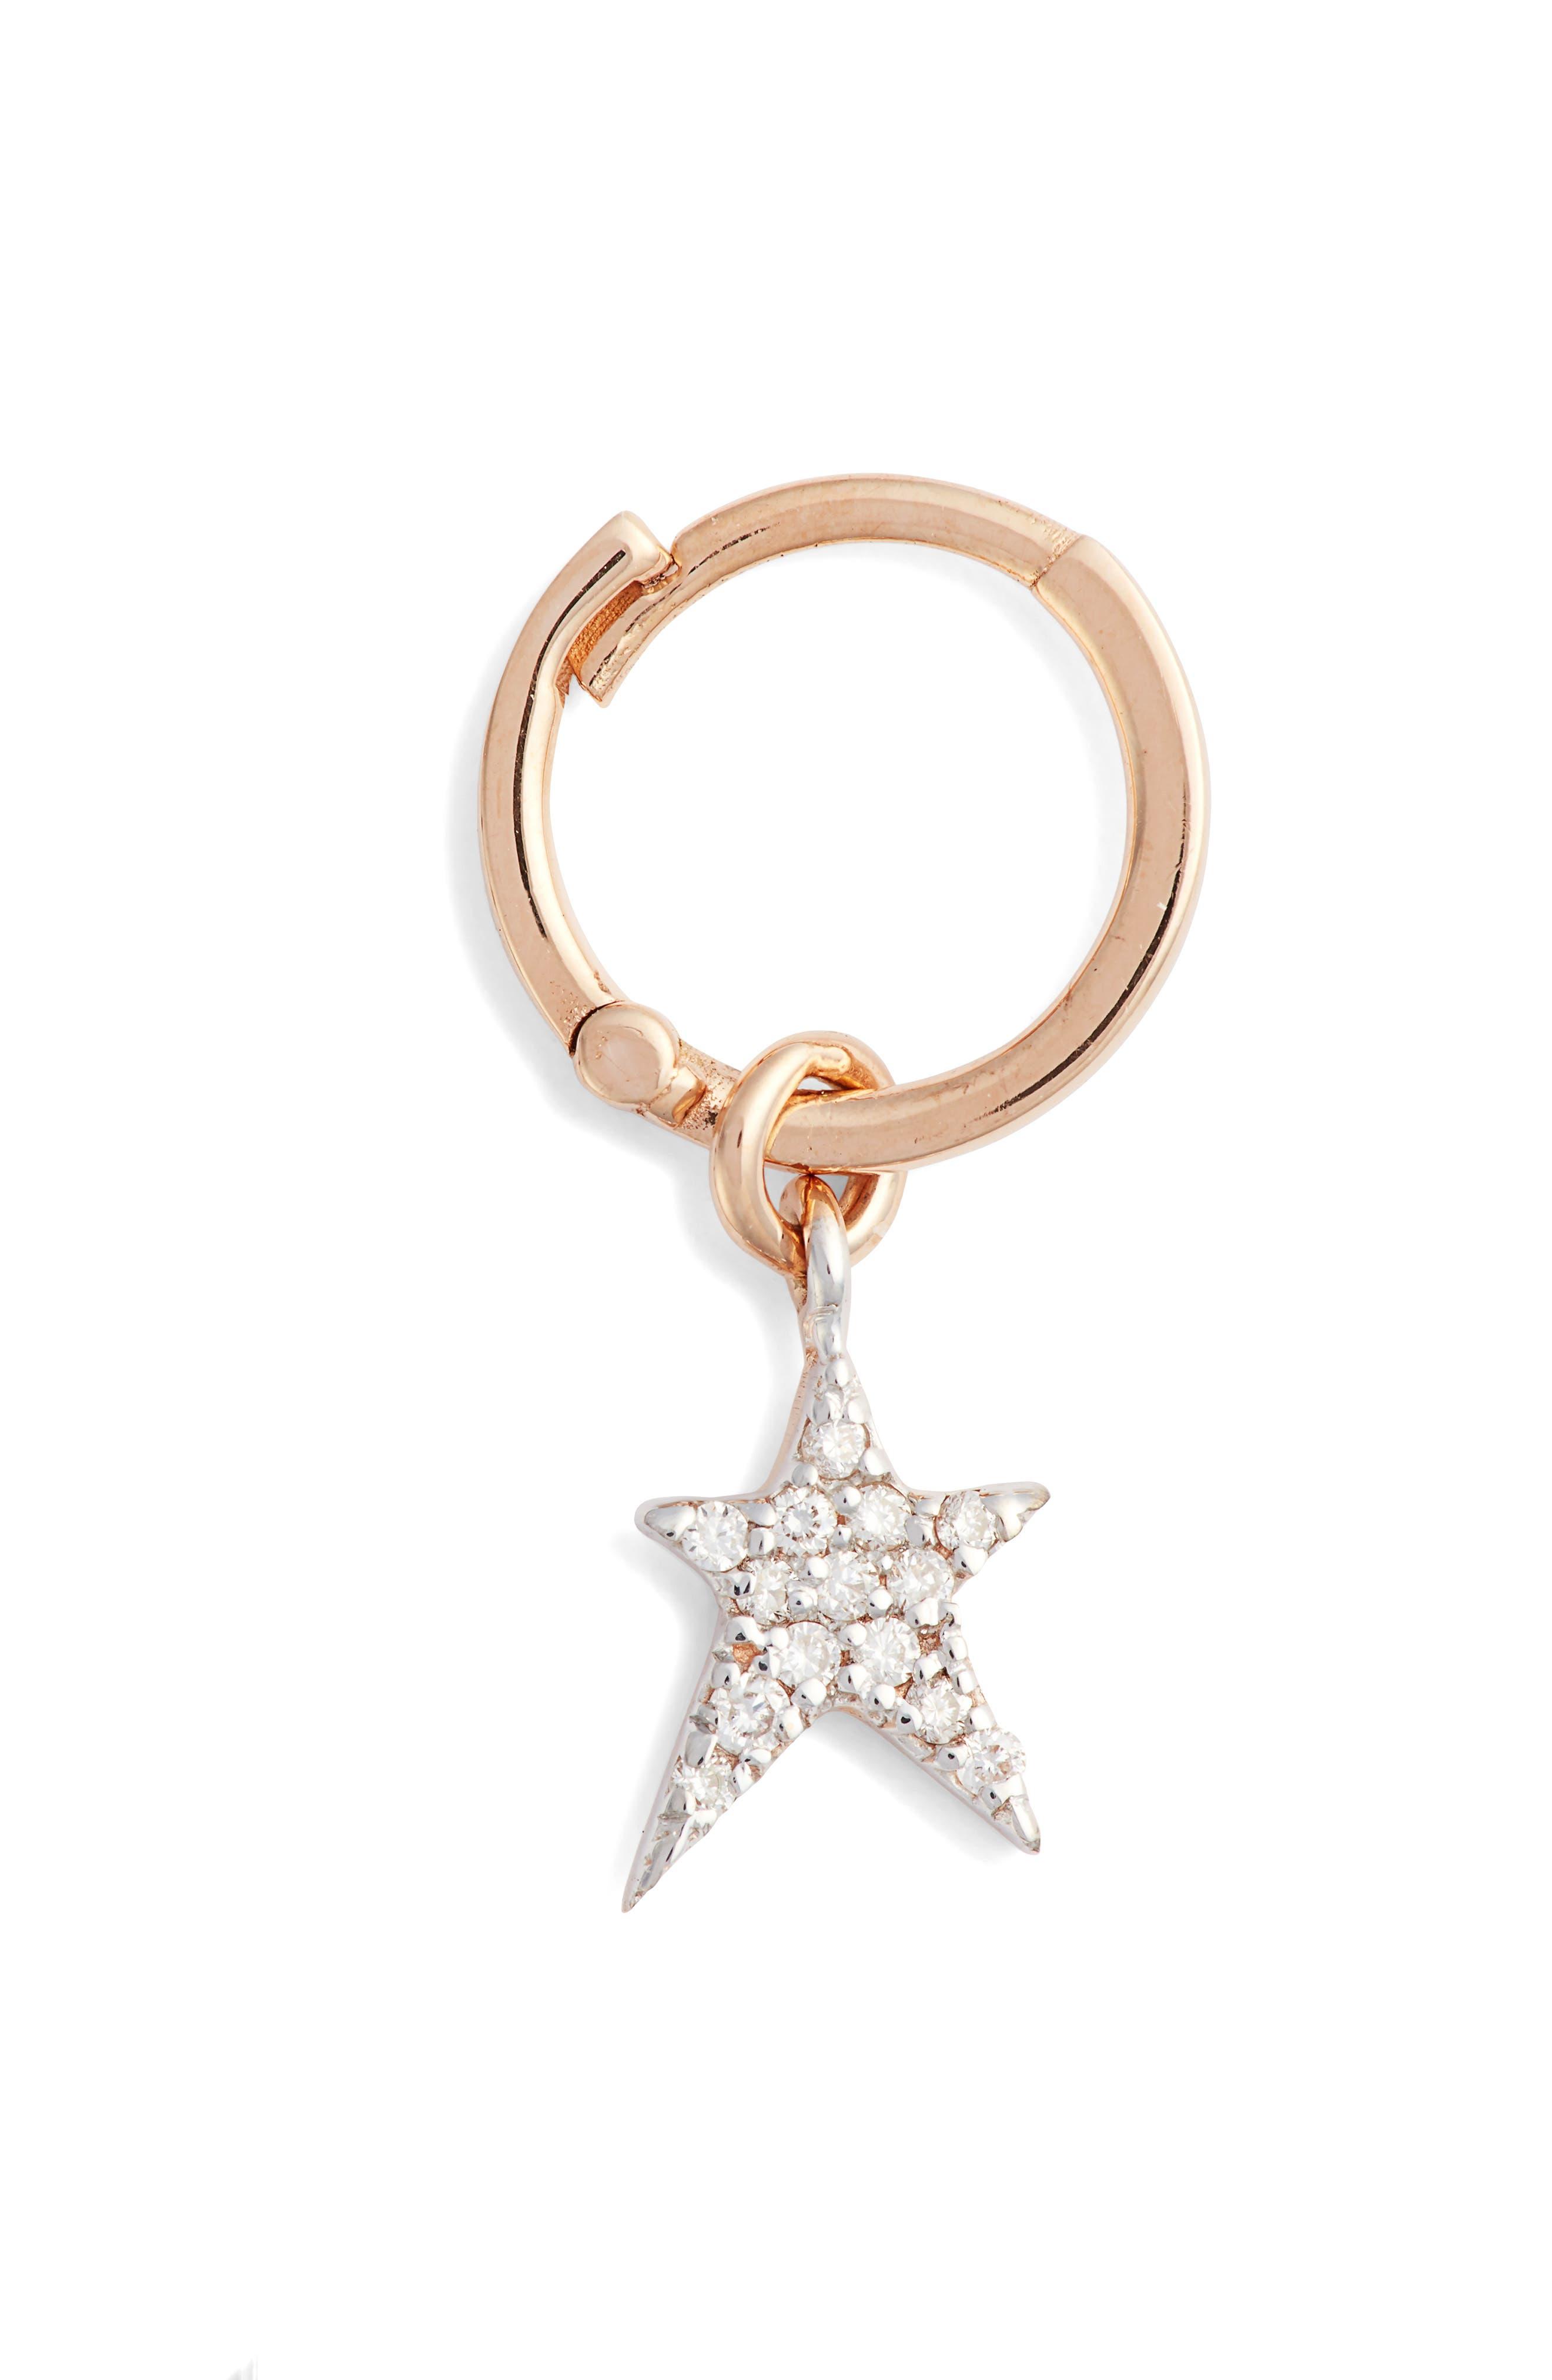 Diamond Starstruck Small Hoop Earring,                             Main thumbnail 1, color,                             ROSE GOLD